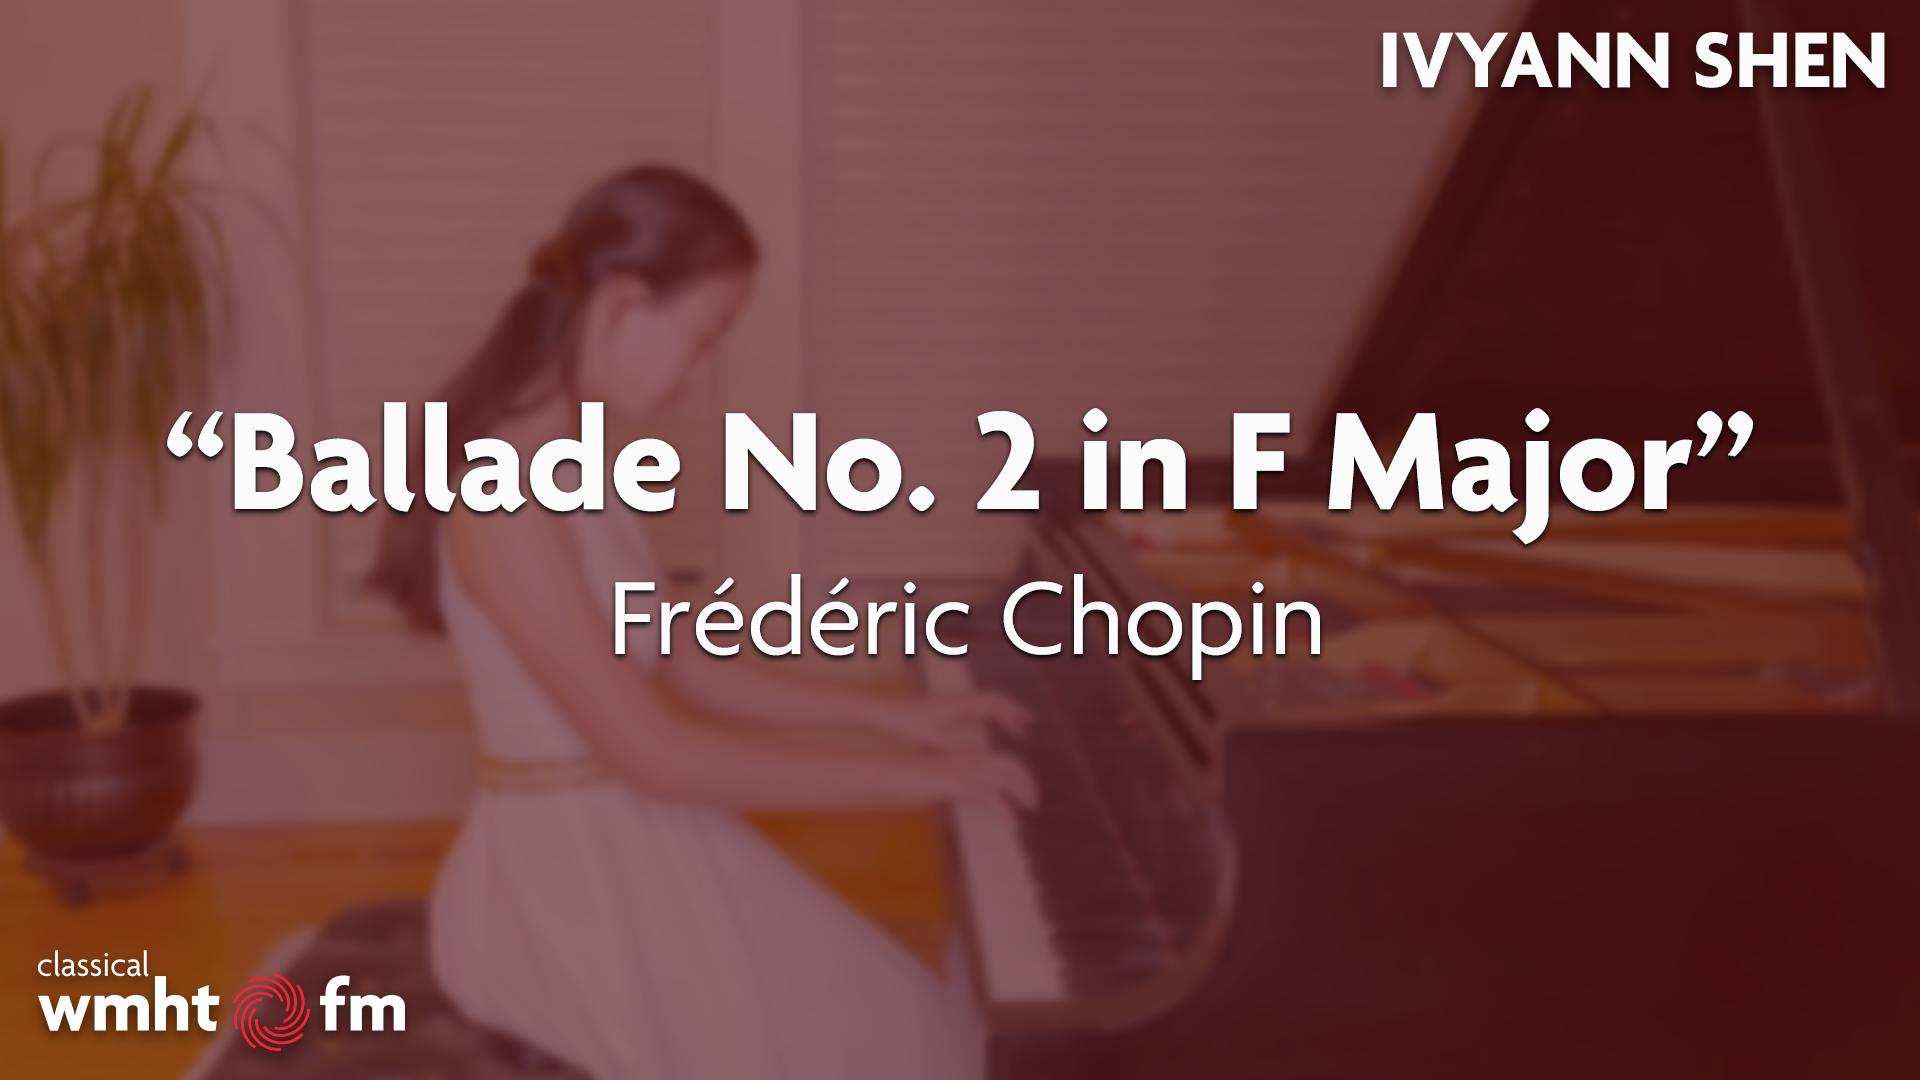 "Ivyann Shen: ""Ballade No. 2 in F Major"" by Frédéric Chopin"